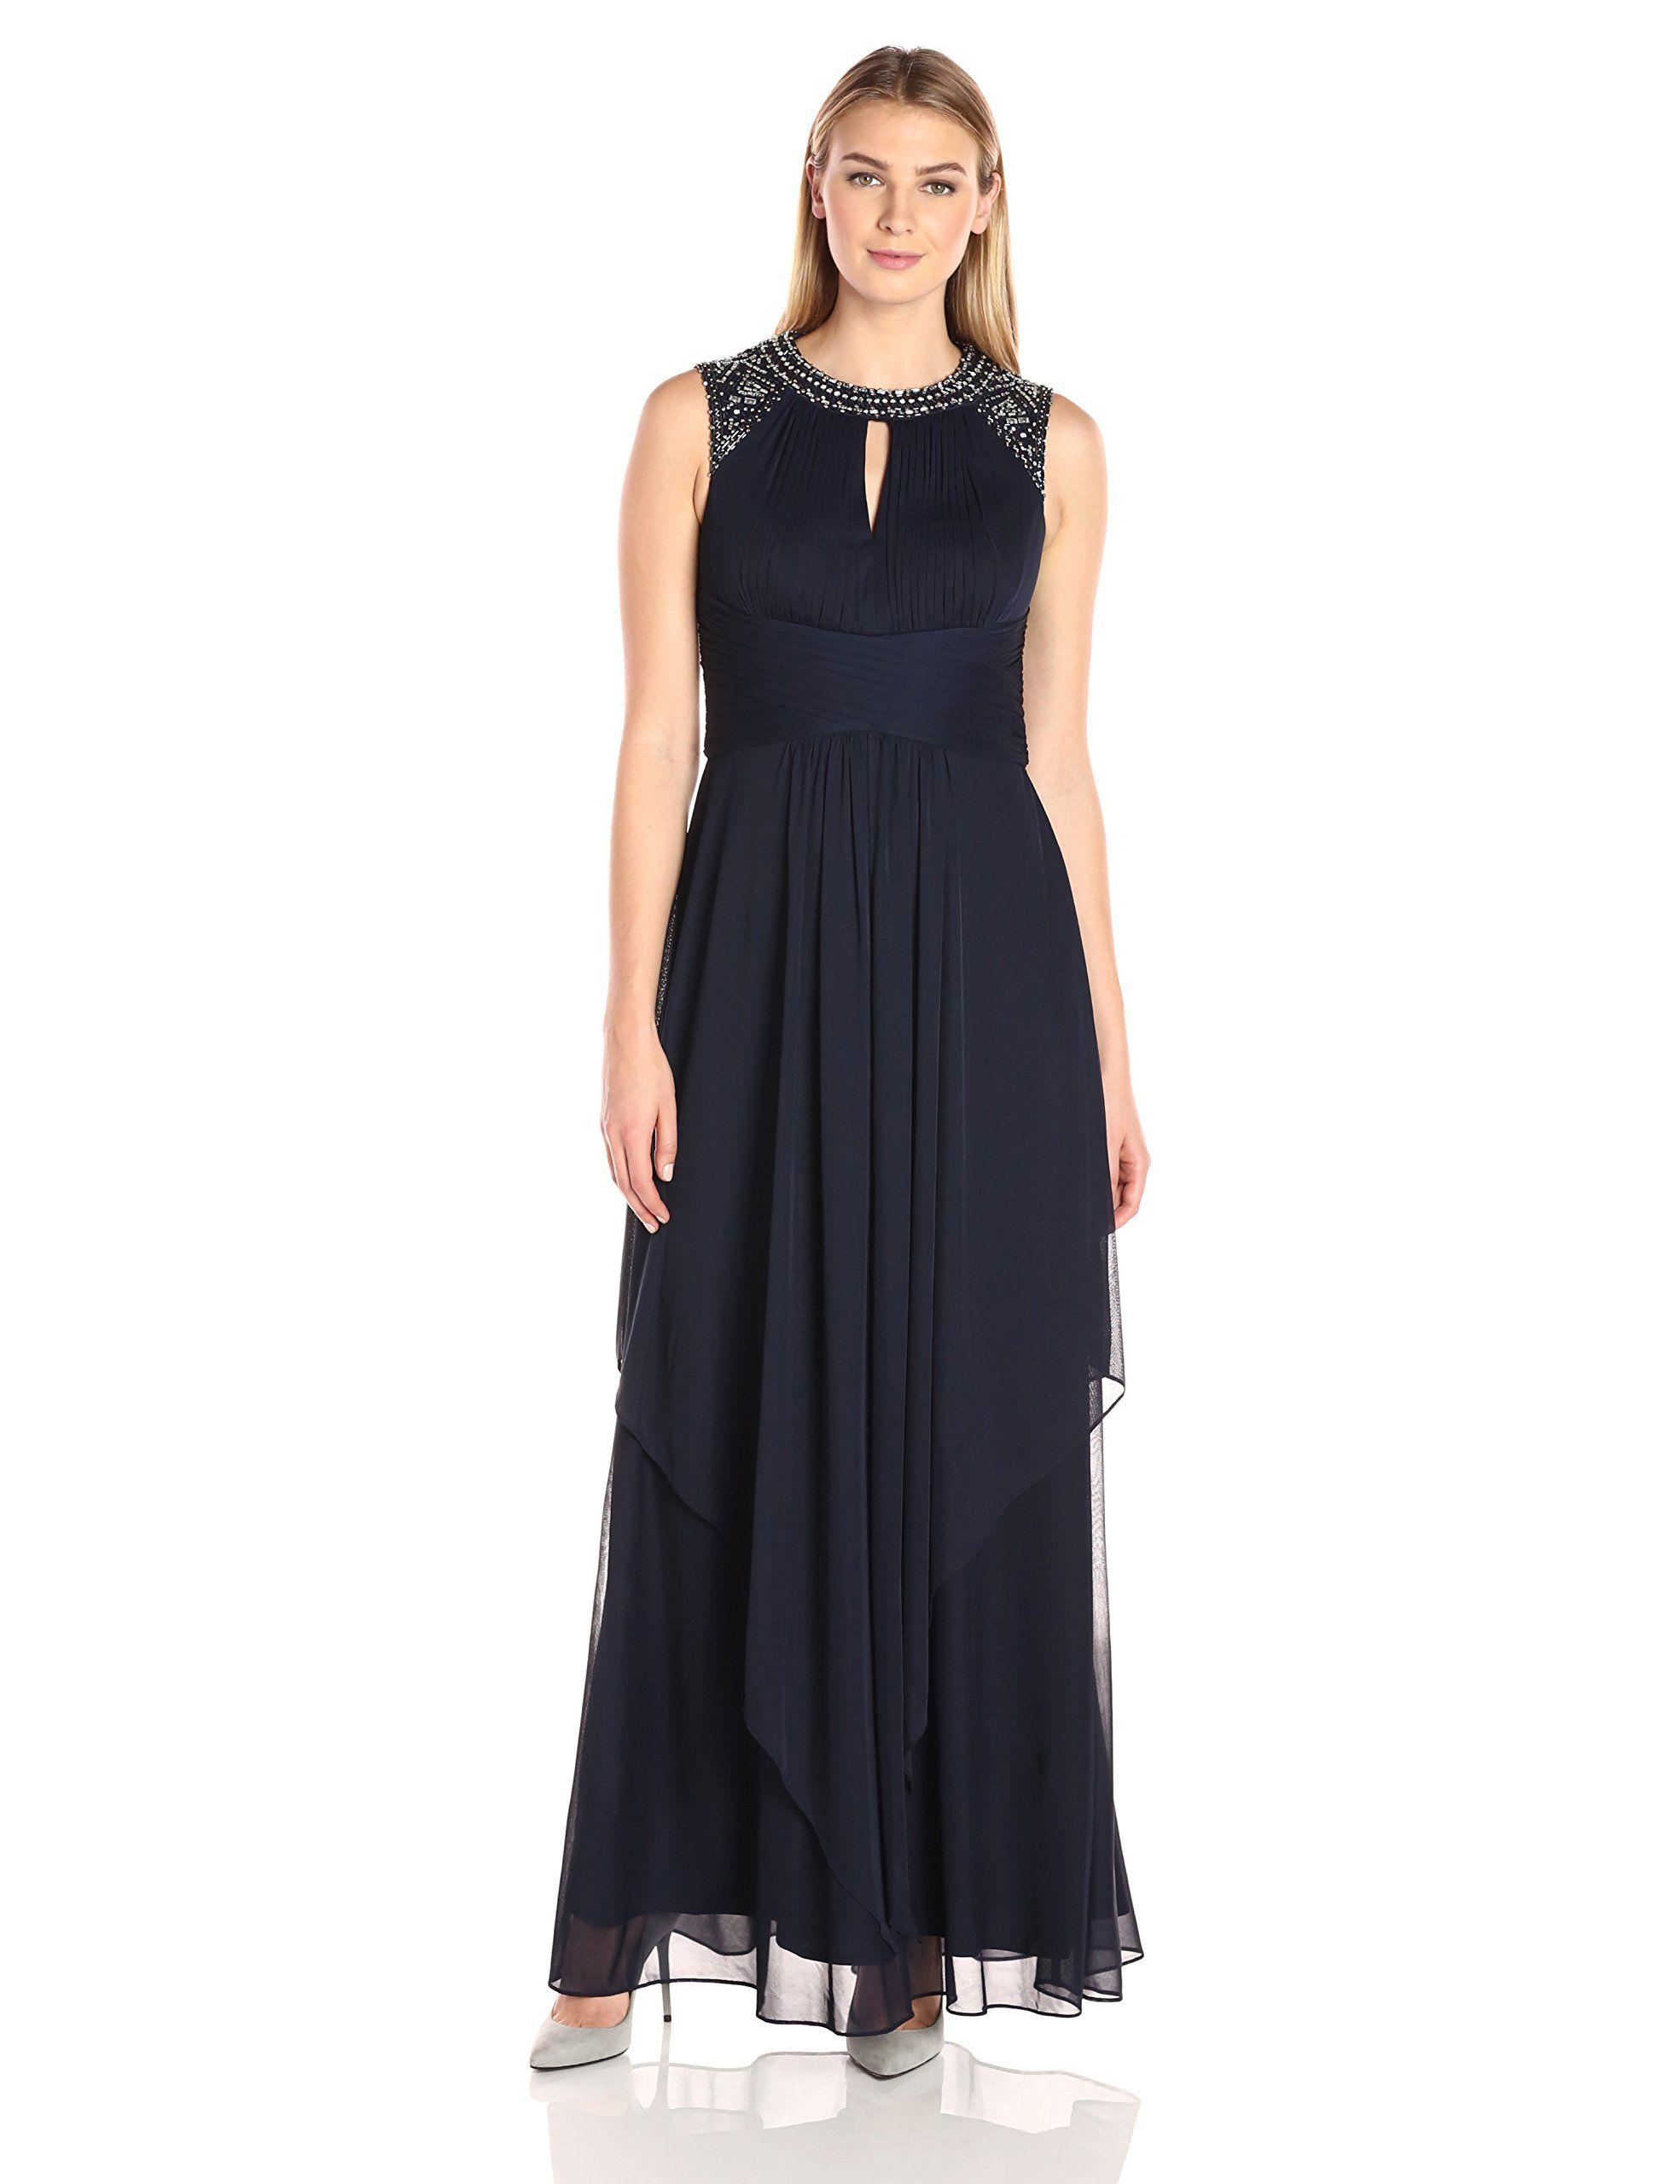 Alex evenings womenus jewel neck long dress dark navy joanna